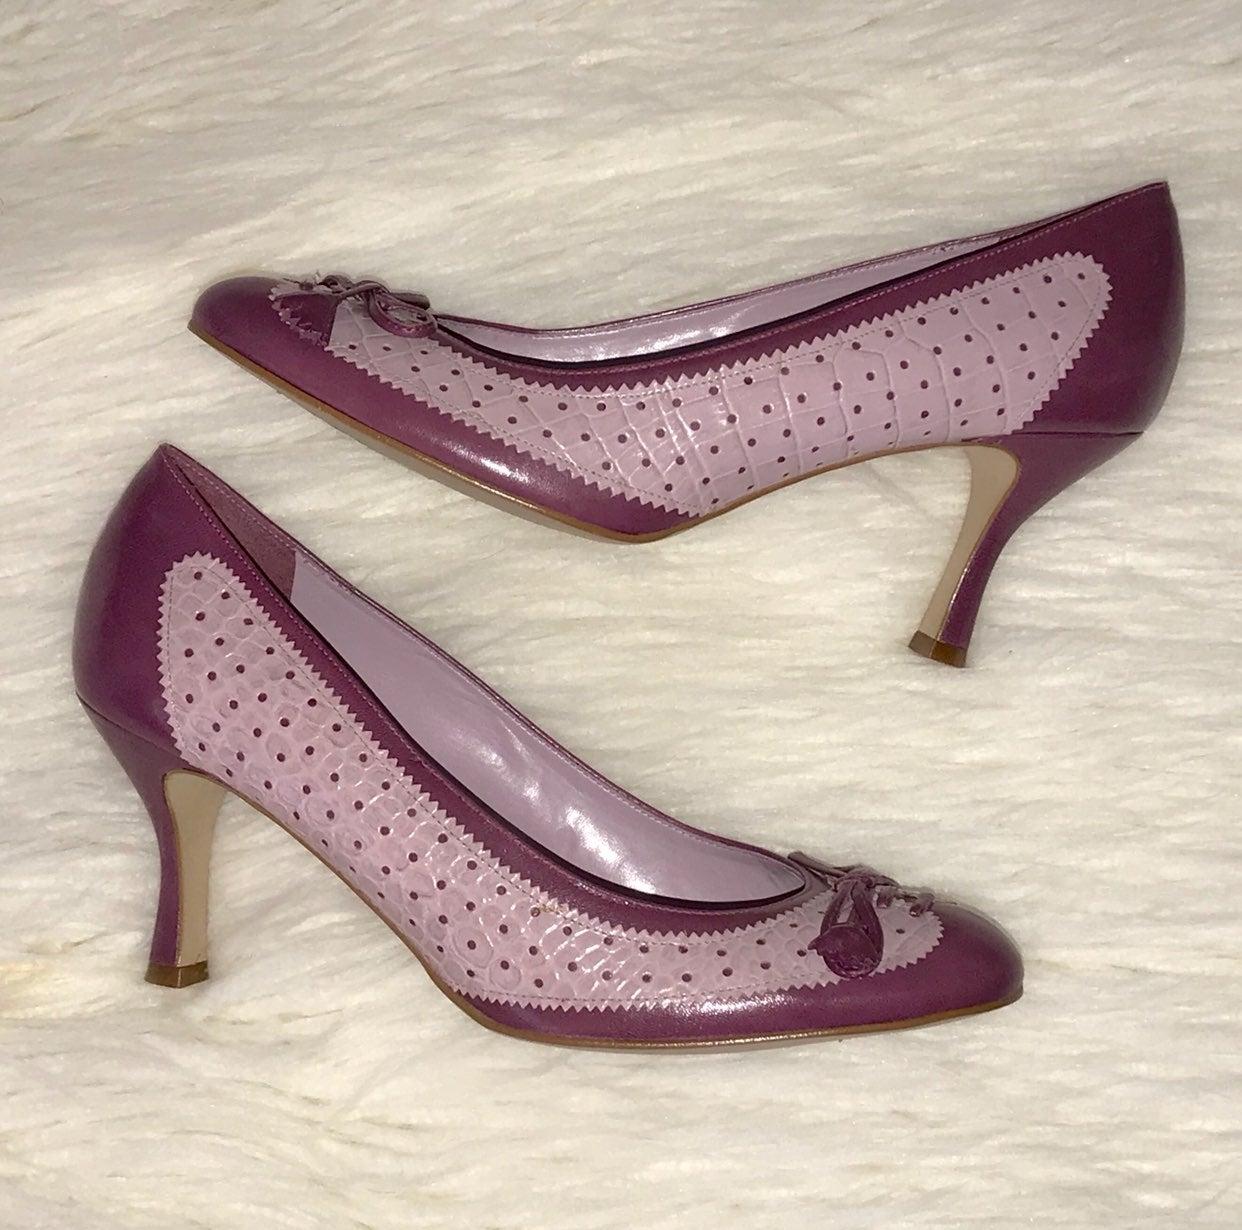 Gianni Bini High Heel Pumps 8.5